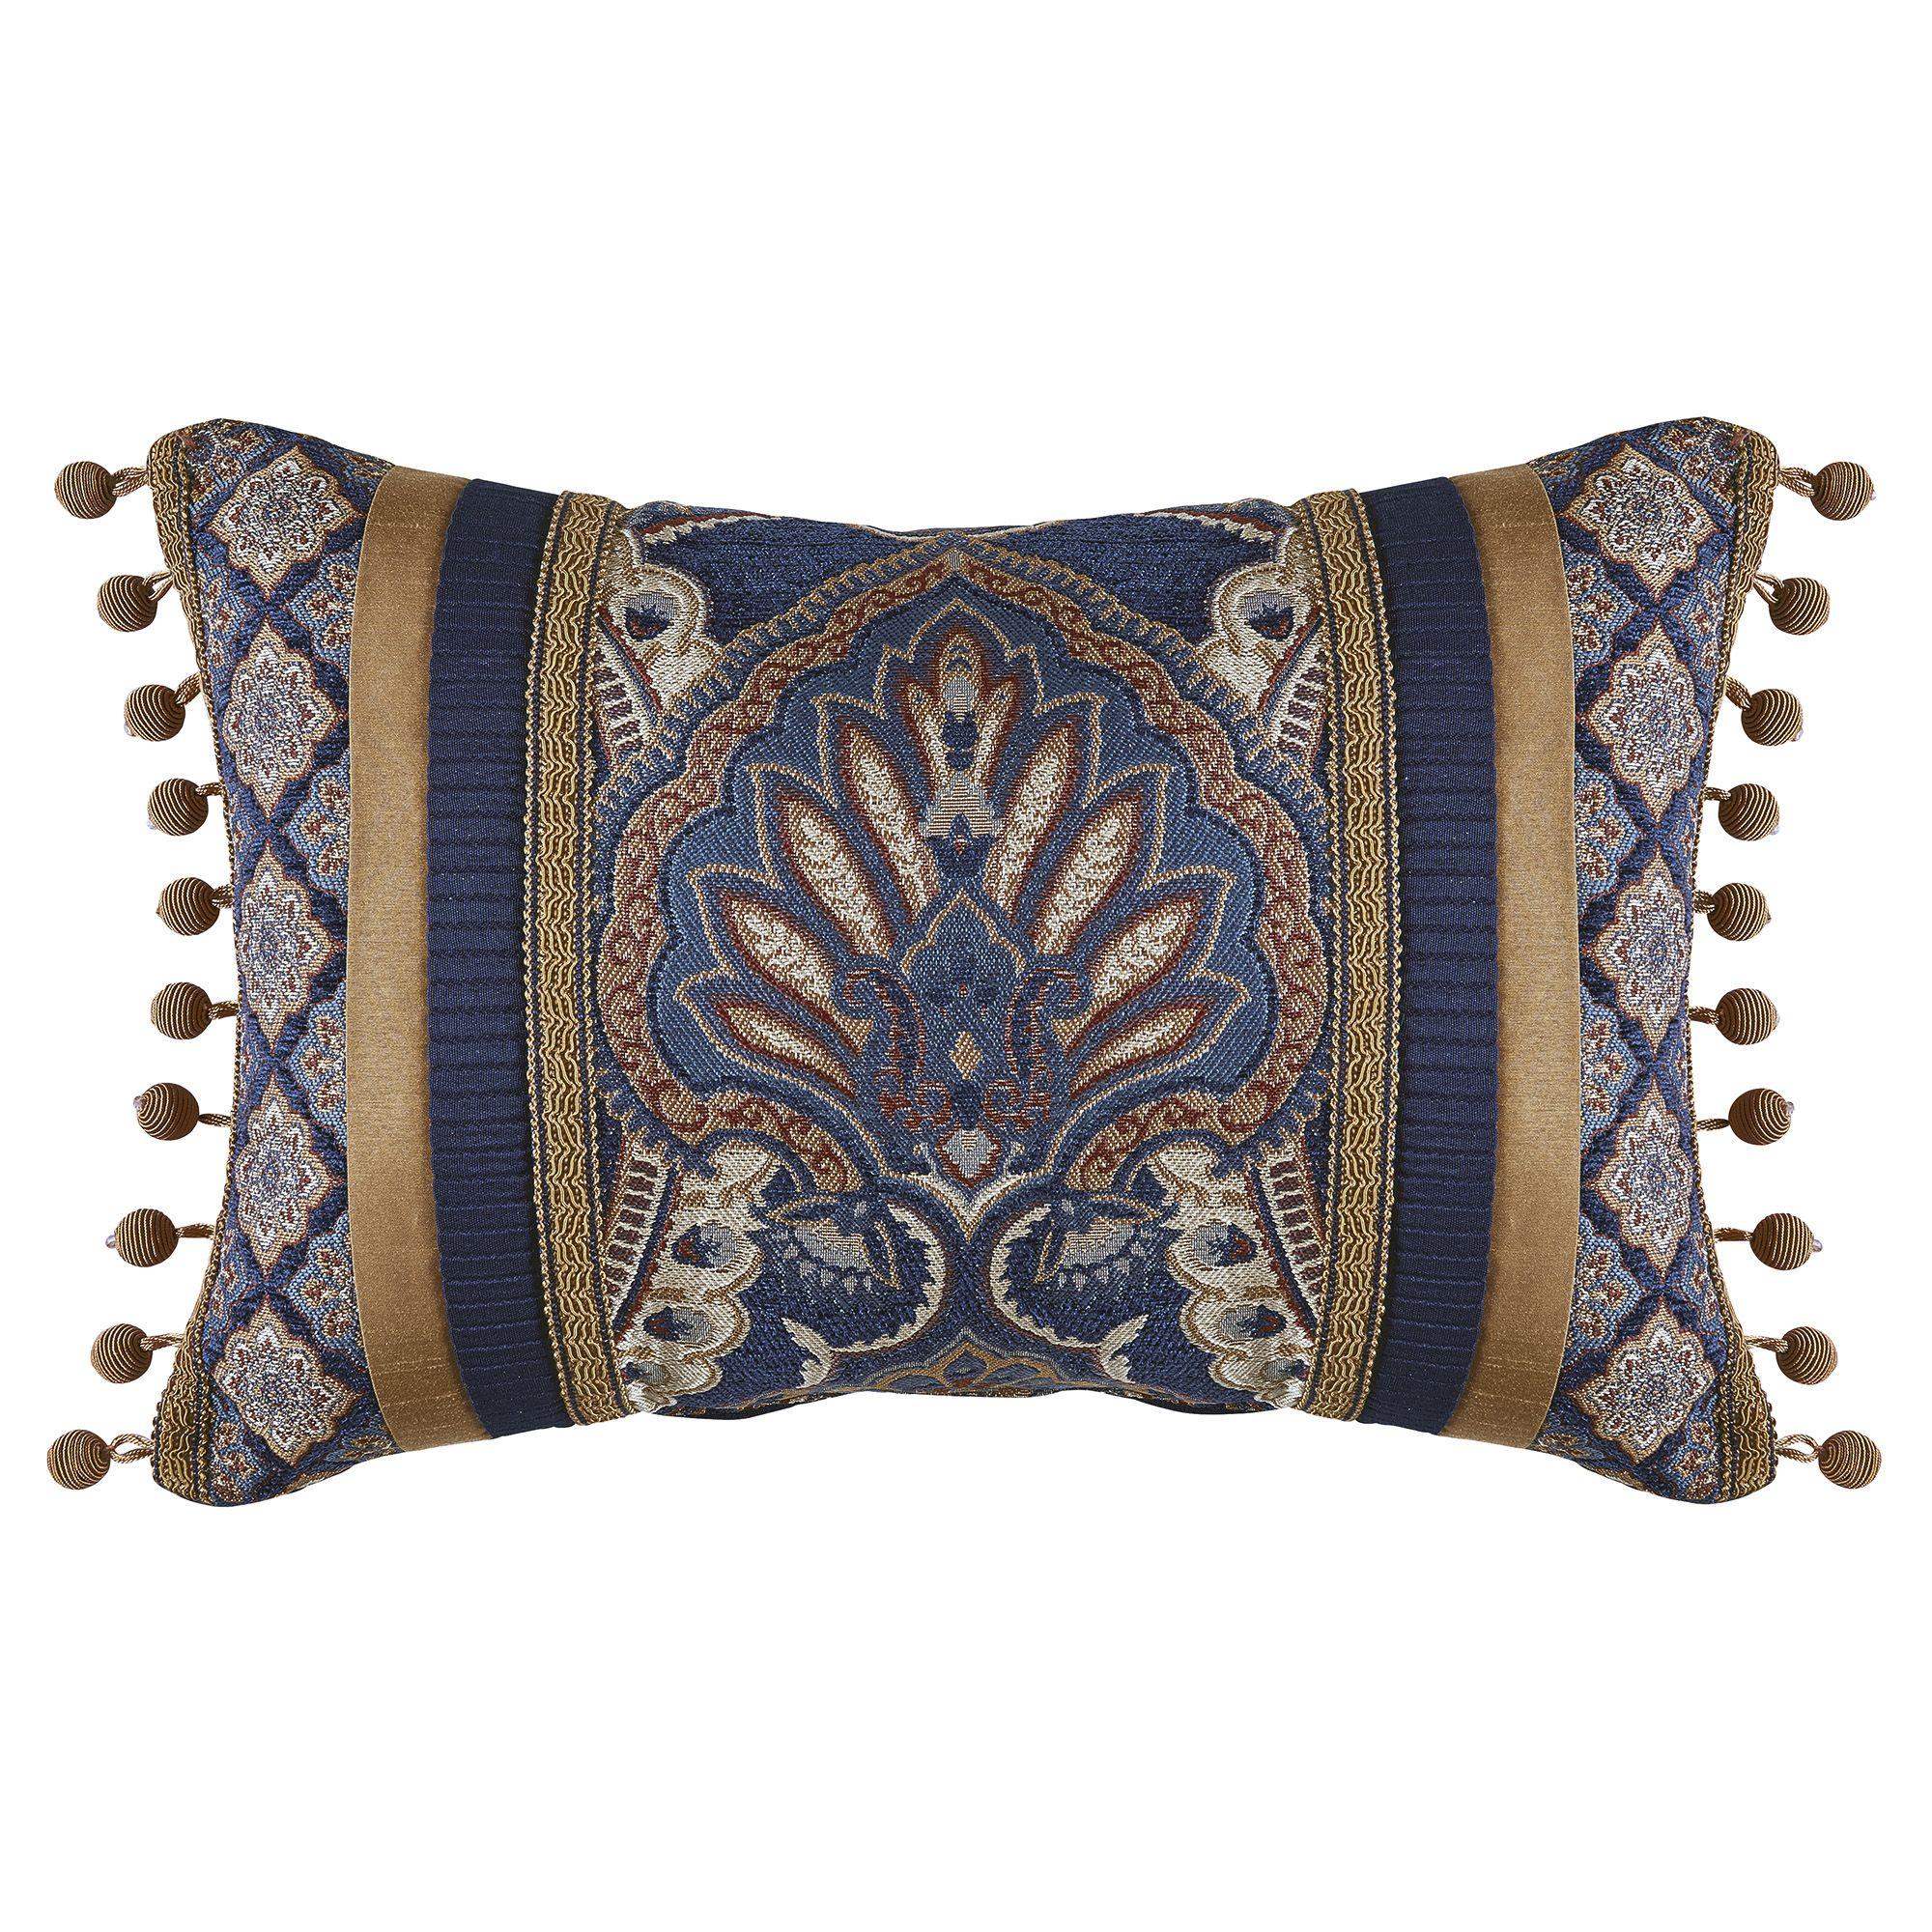 Aurelio Boudoir Pillow Blue Pillows Decorative Throw Pillows Boudoir Pillow